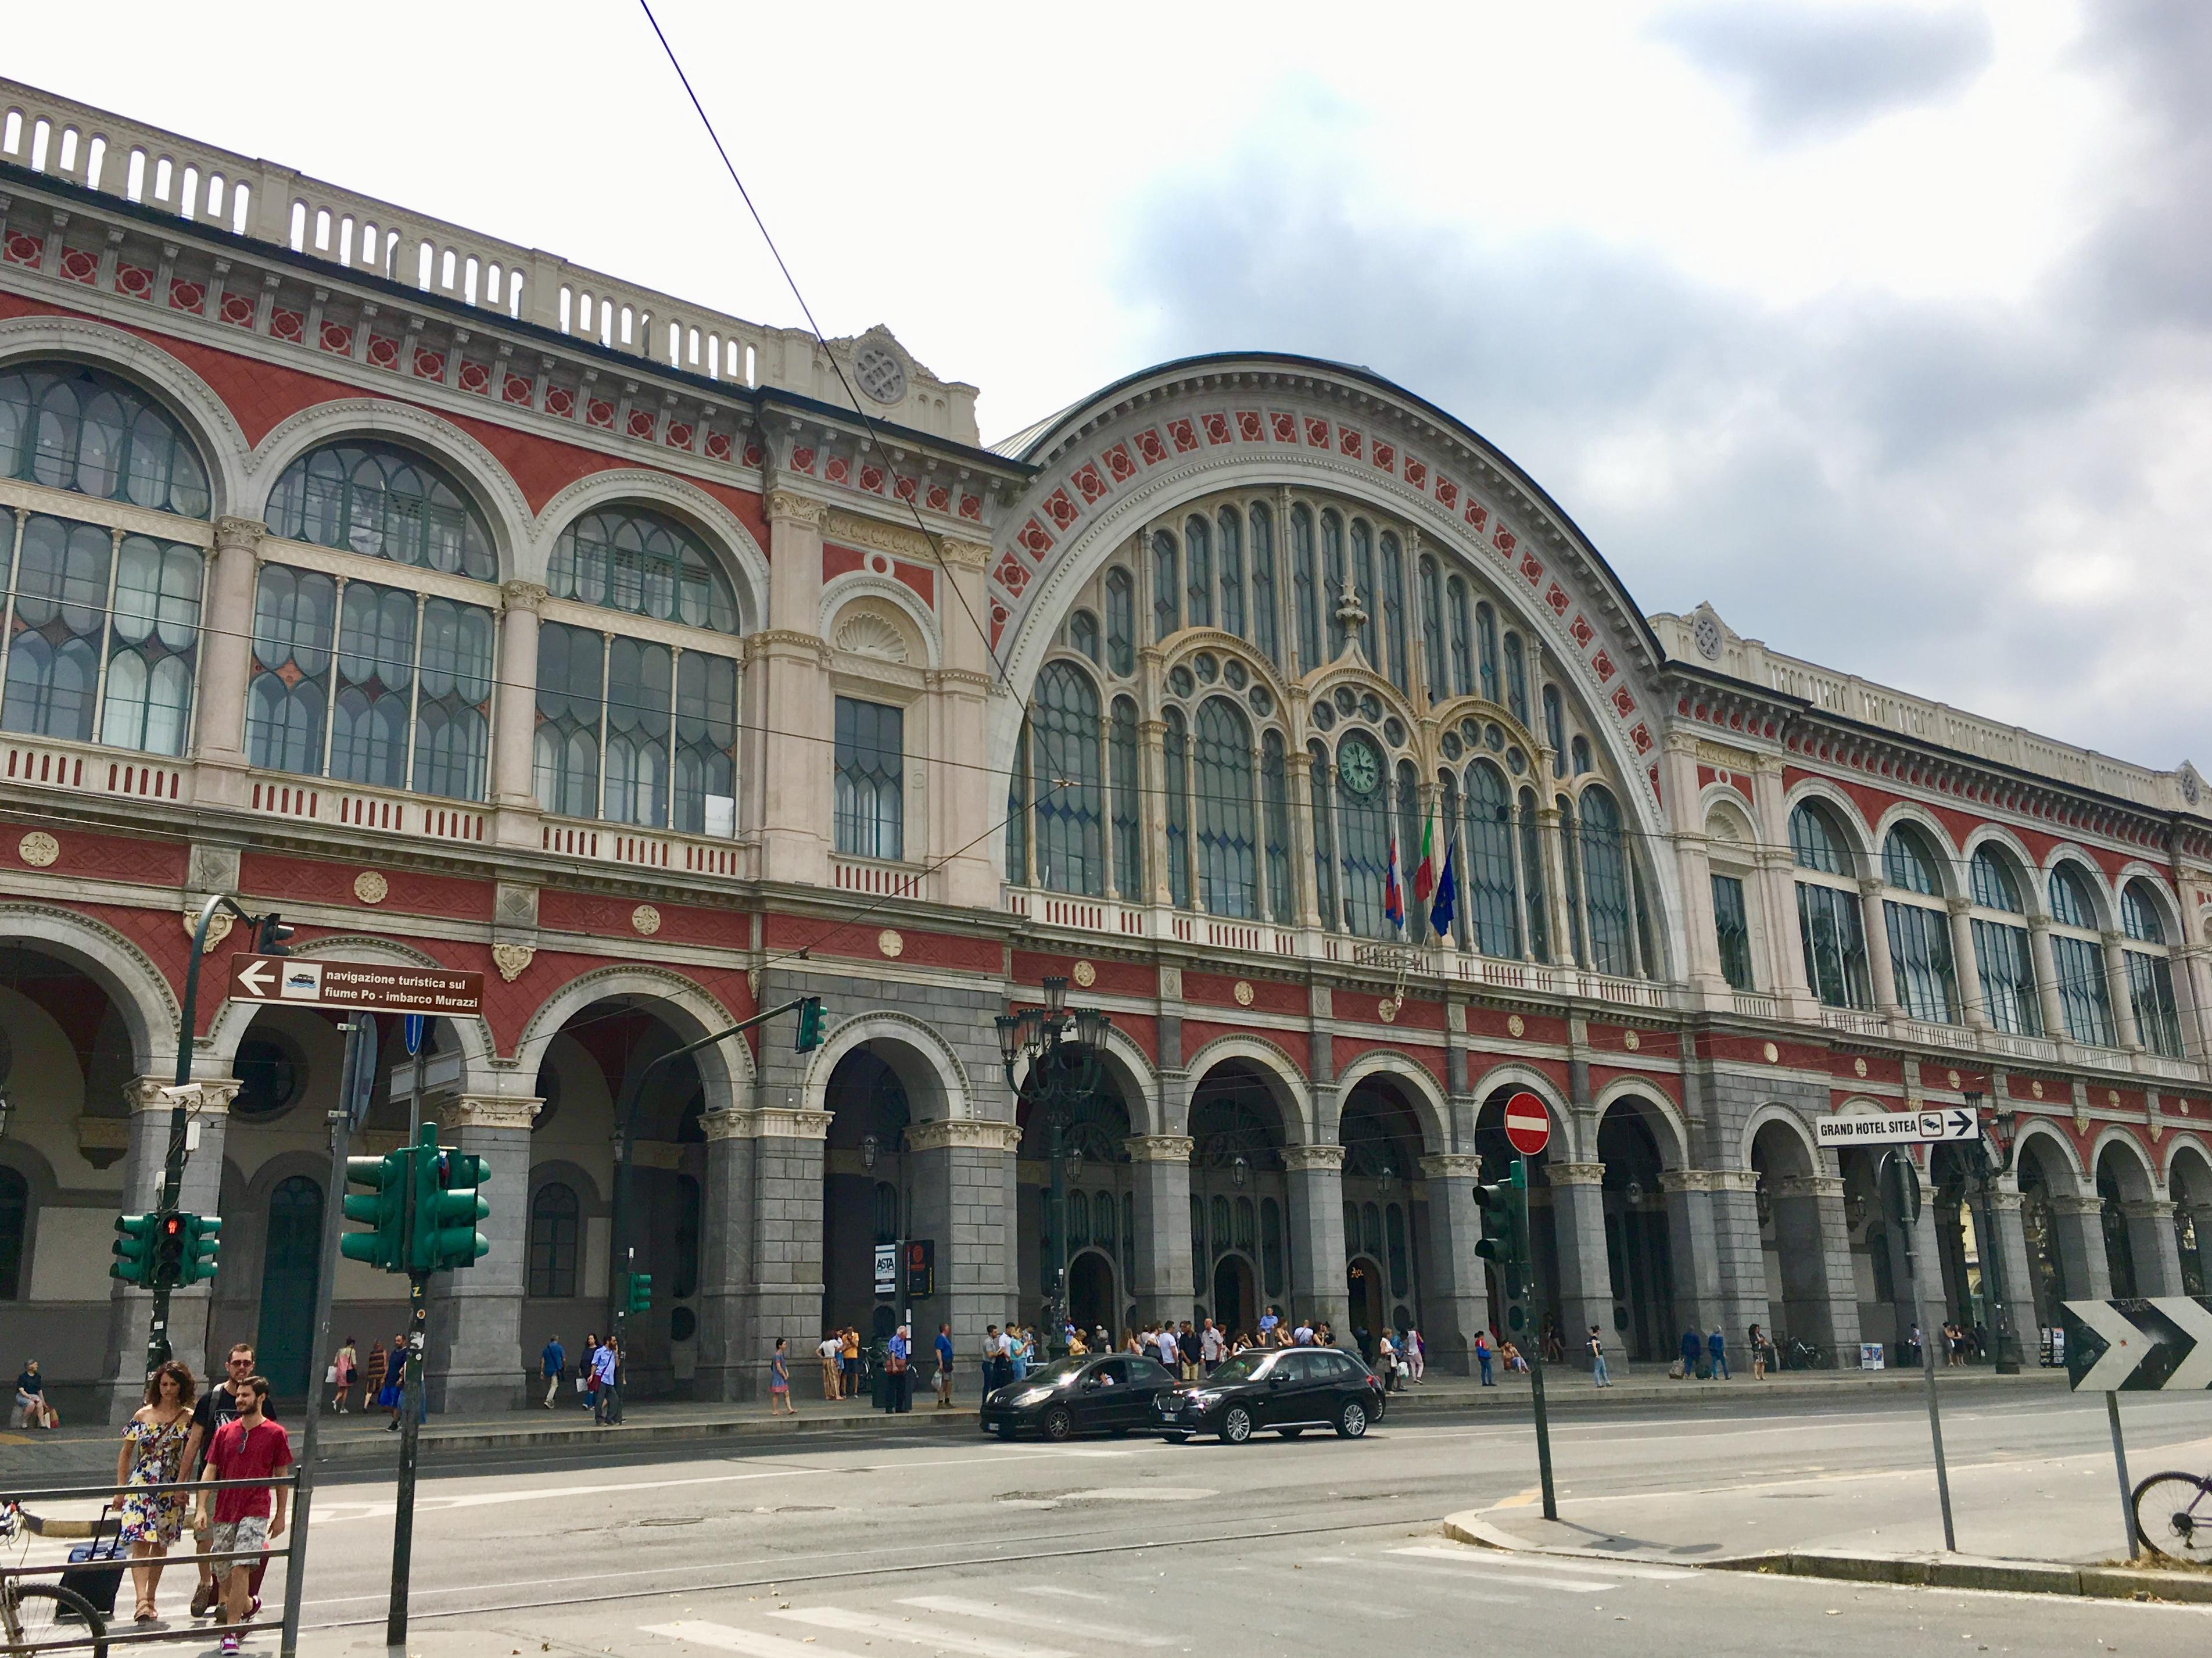 File:Porta Nuova Station Turin.jpg - Wikipedia